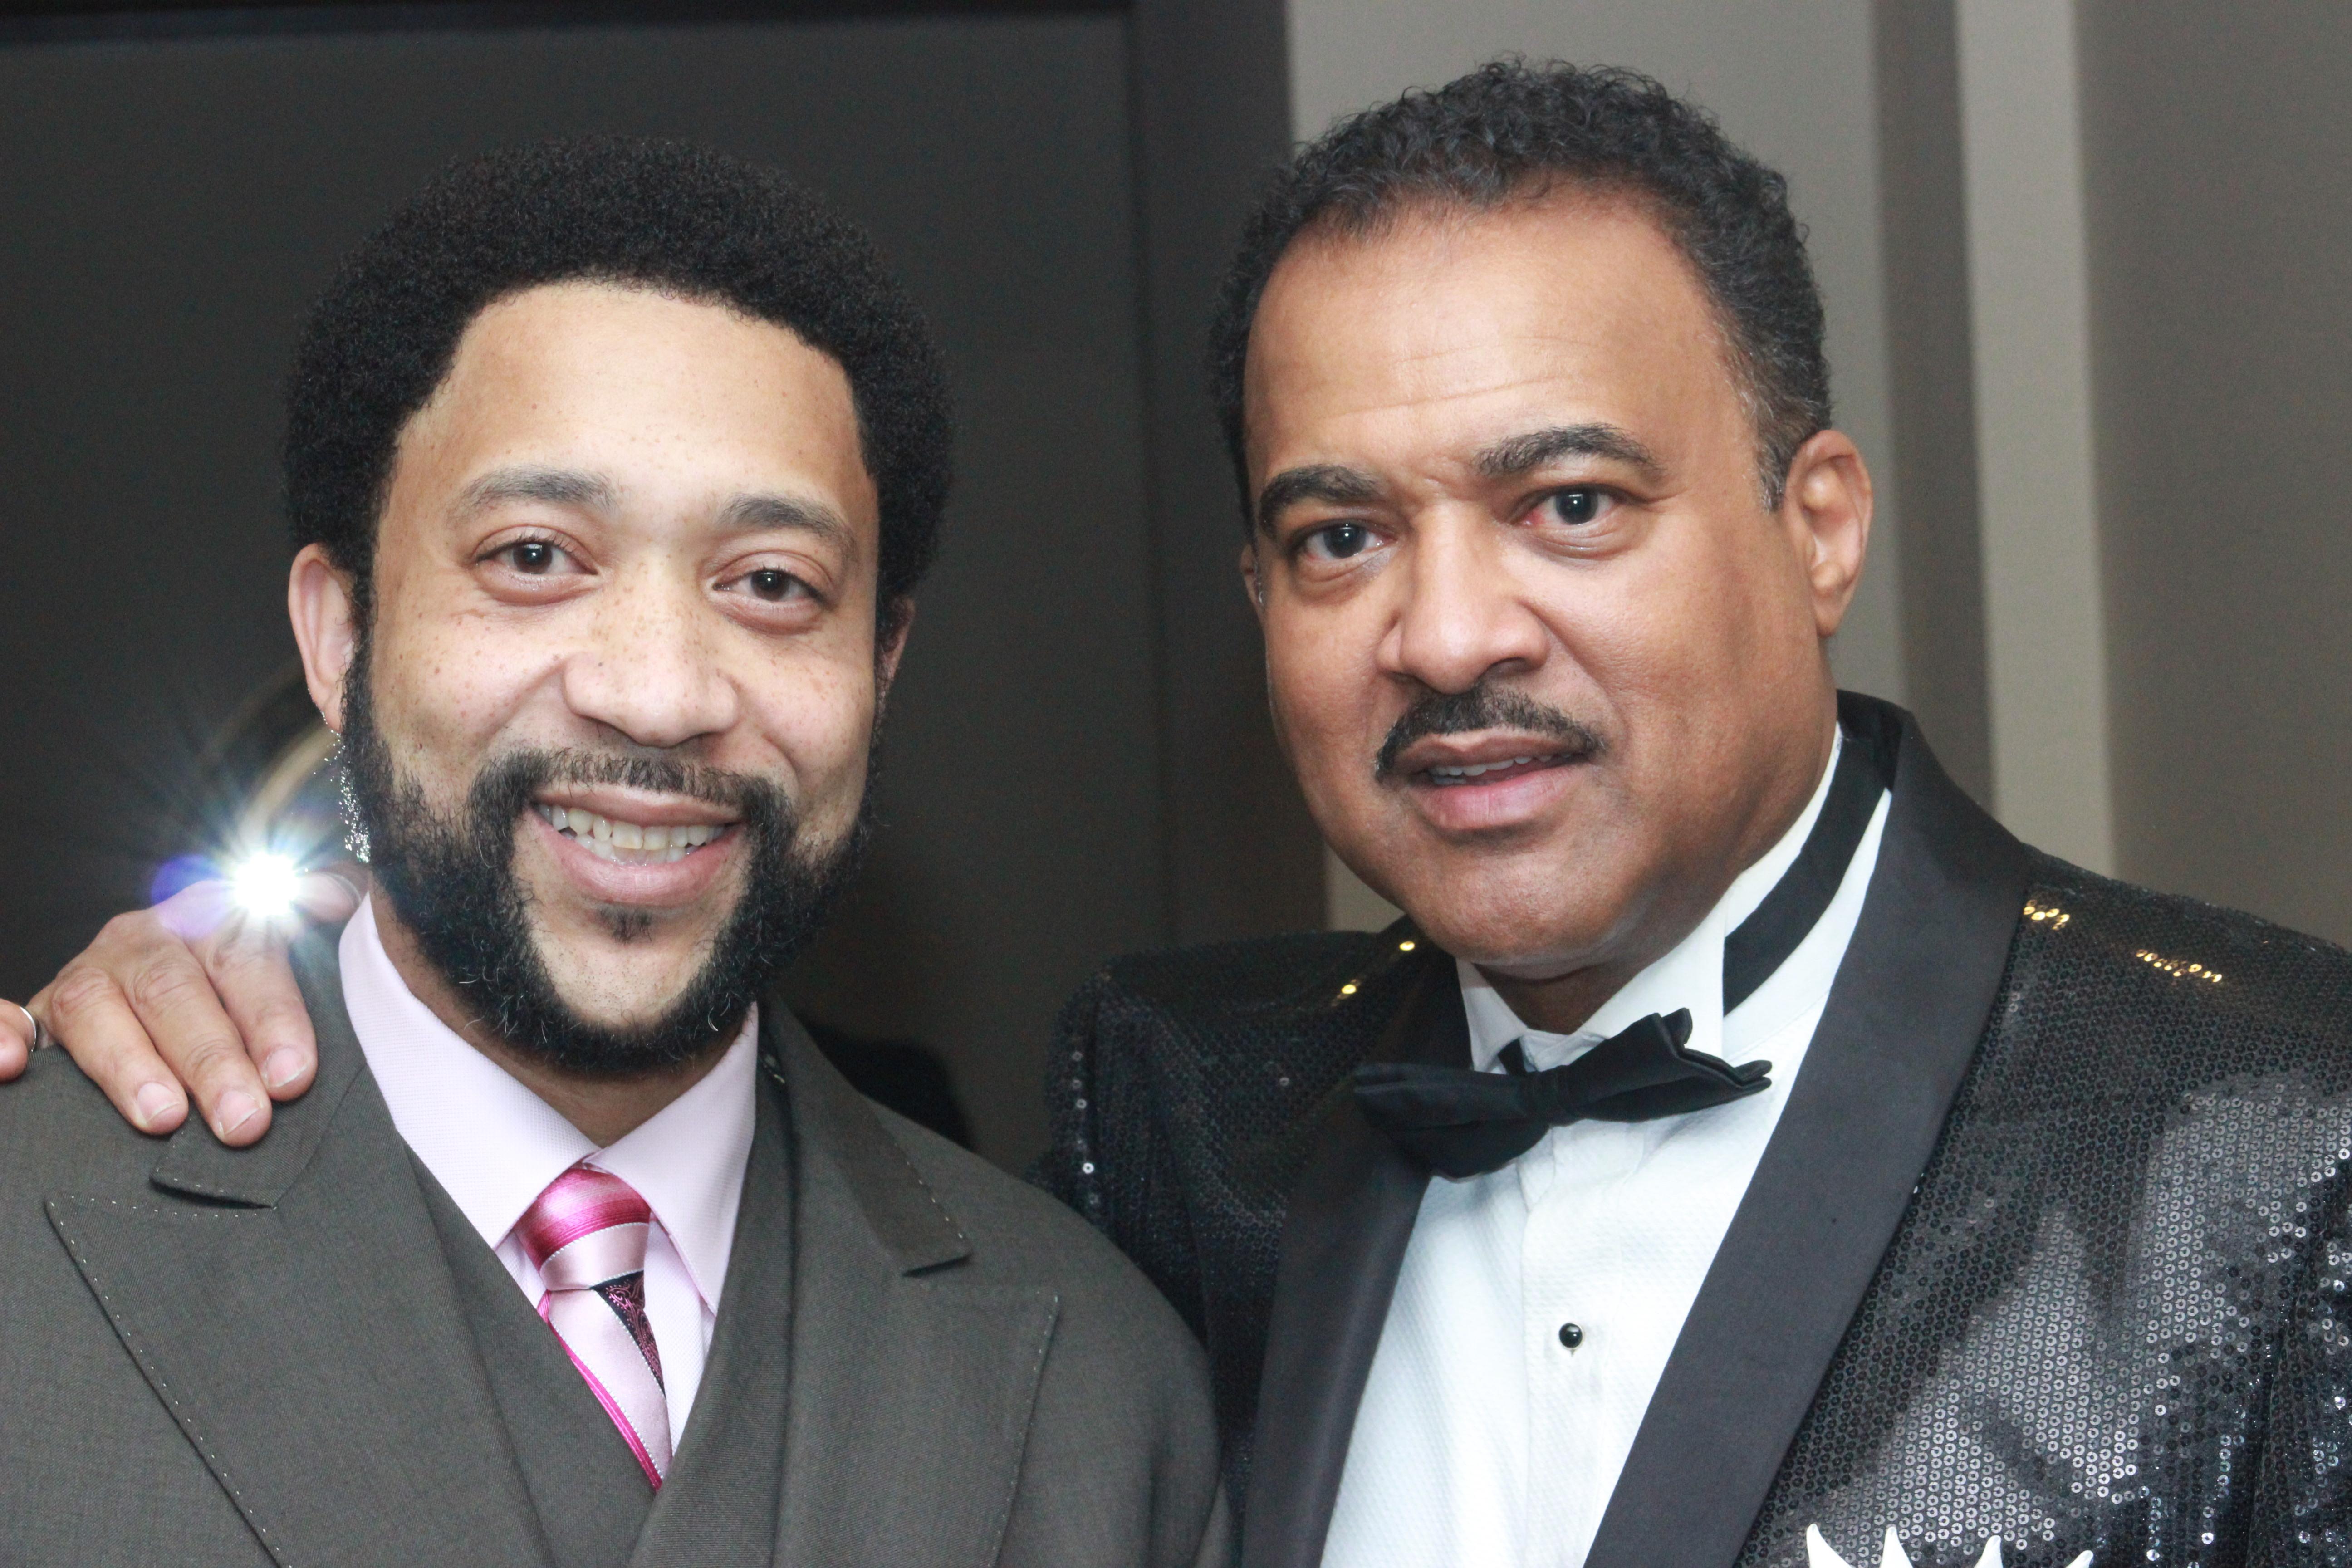 Event MC James Benson and Alvin